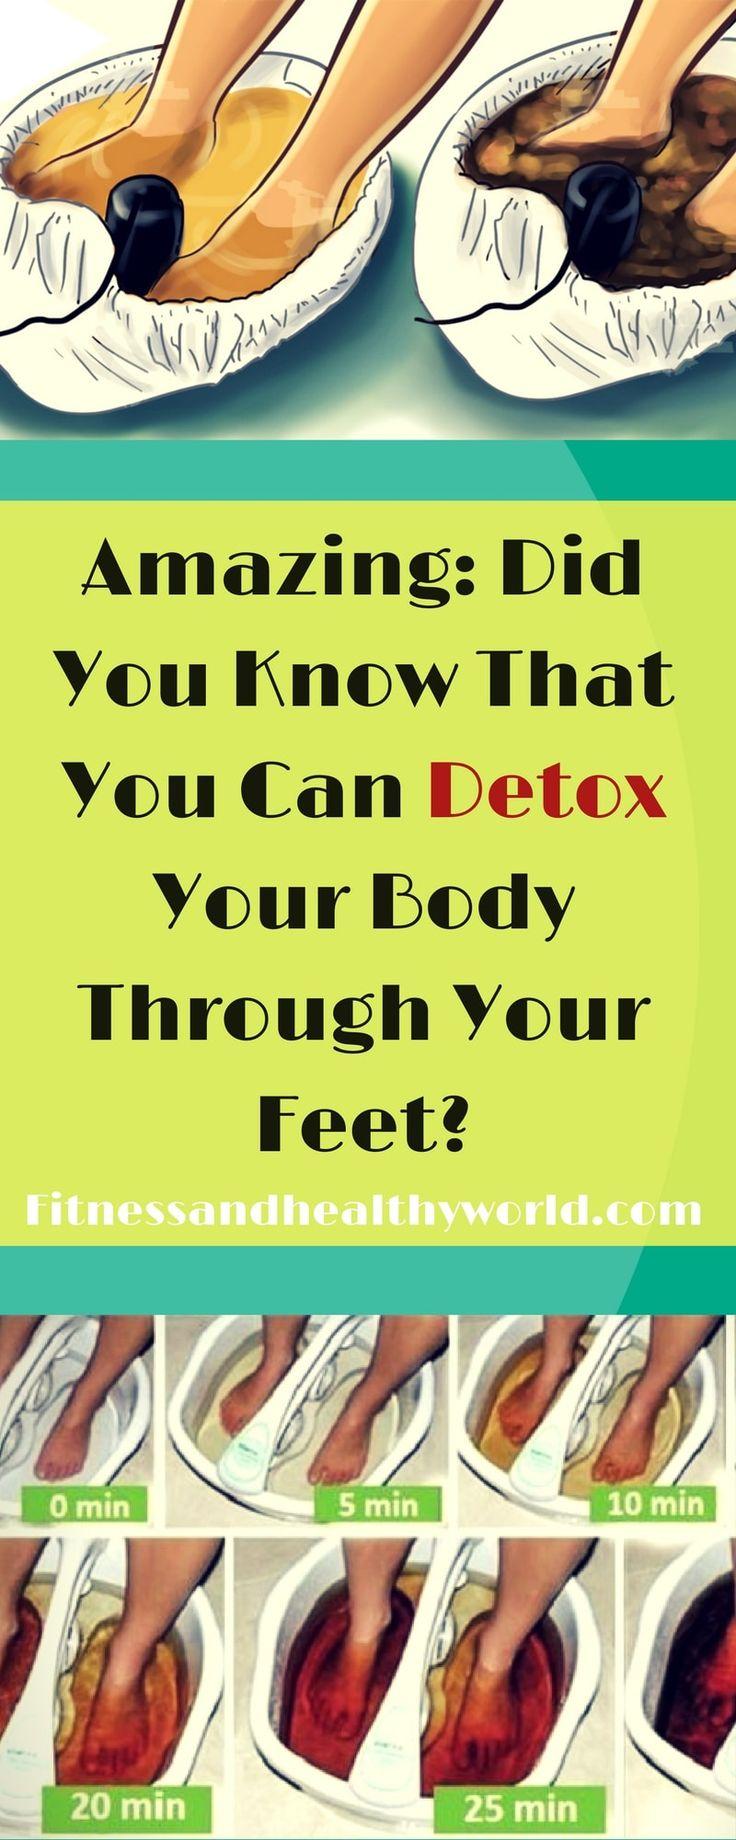 #detox#body#health#feet#toxins